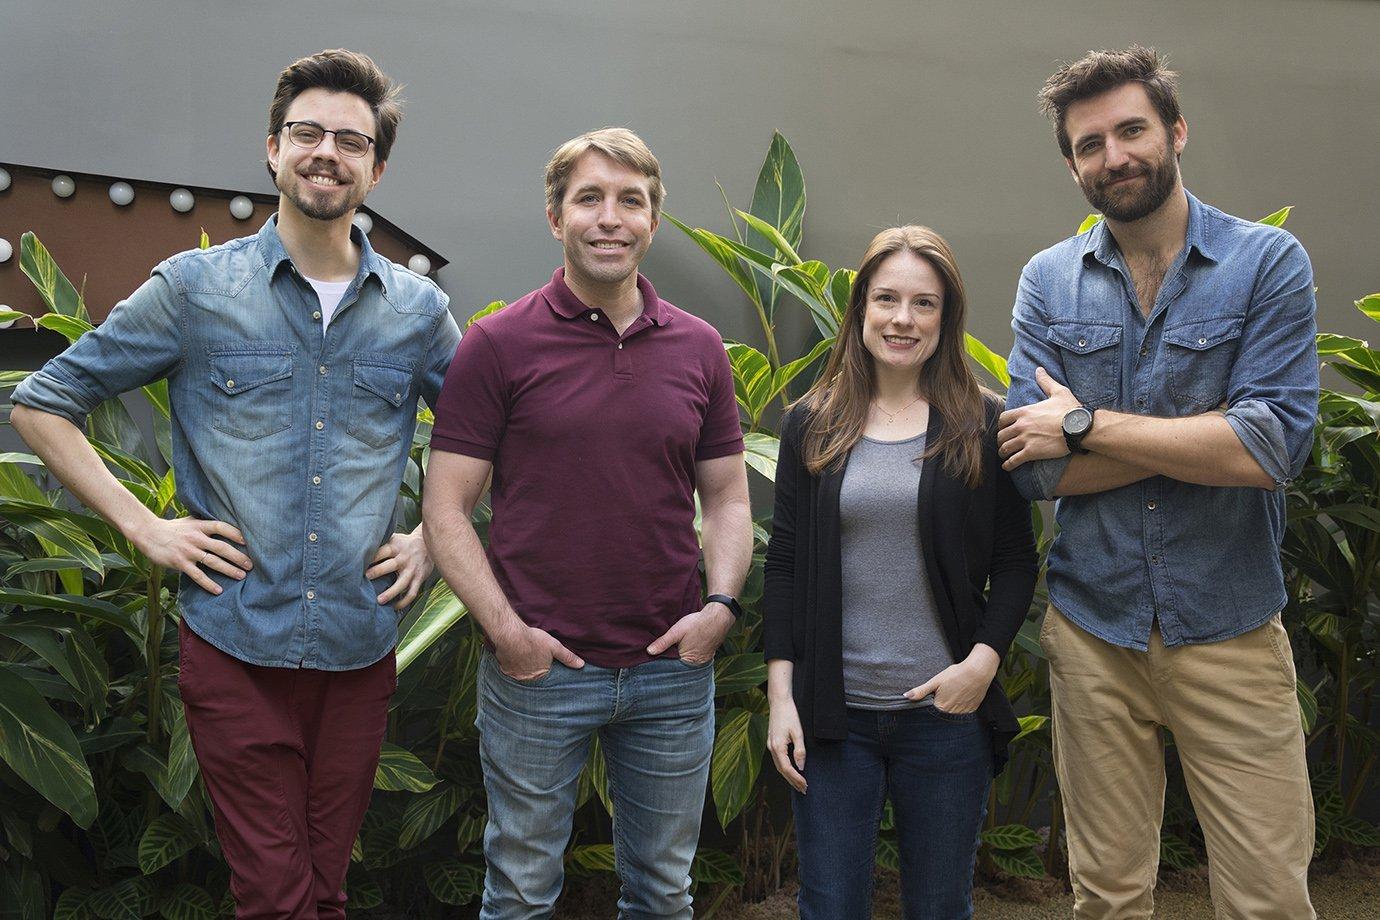 Equipe da startup Hondana